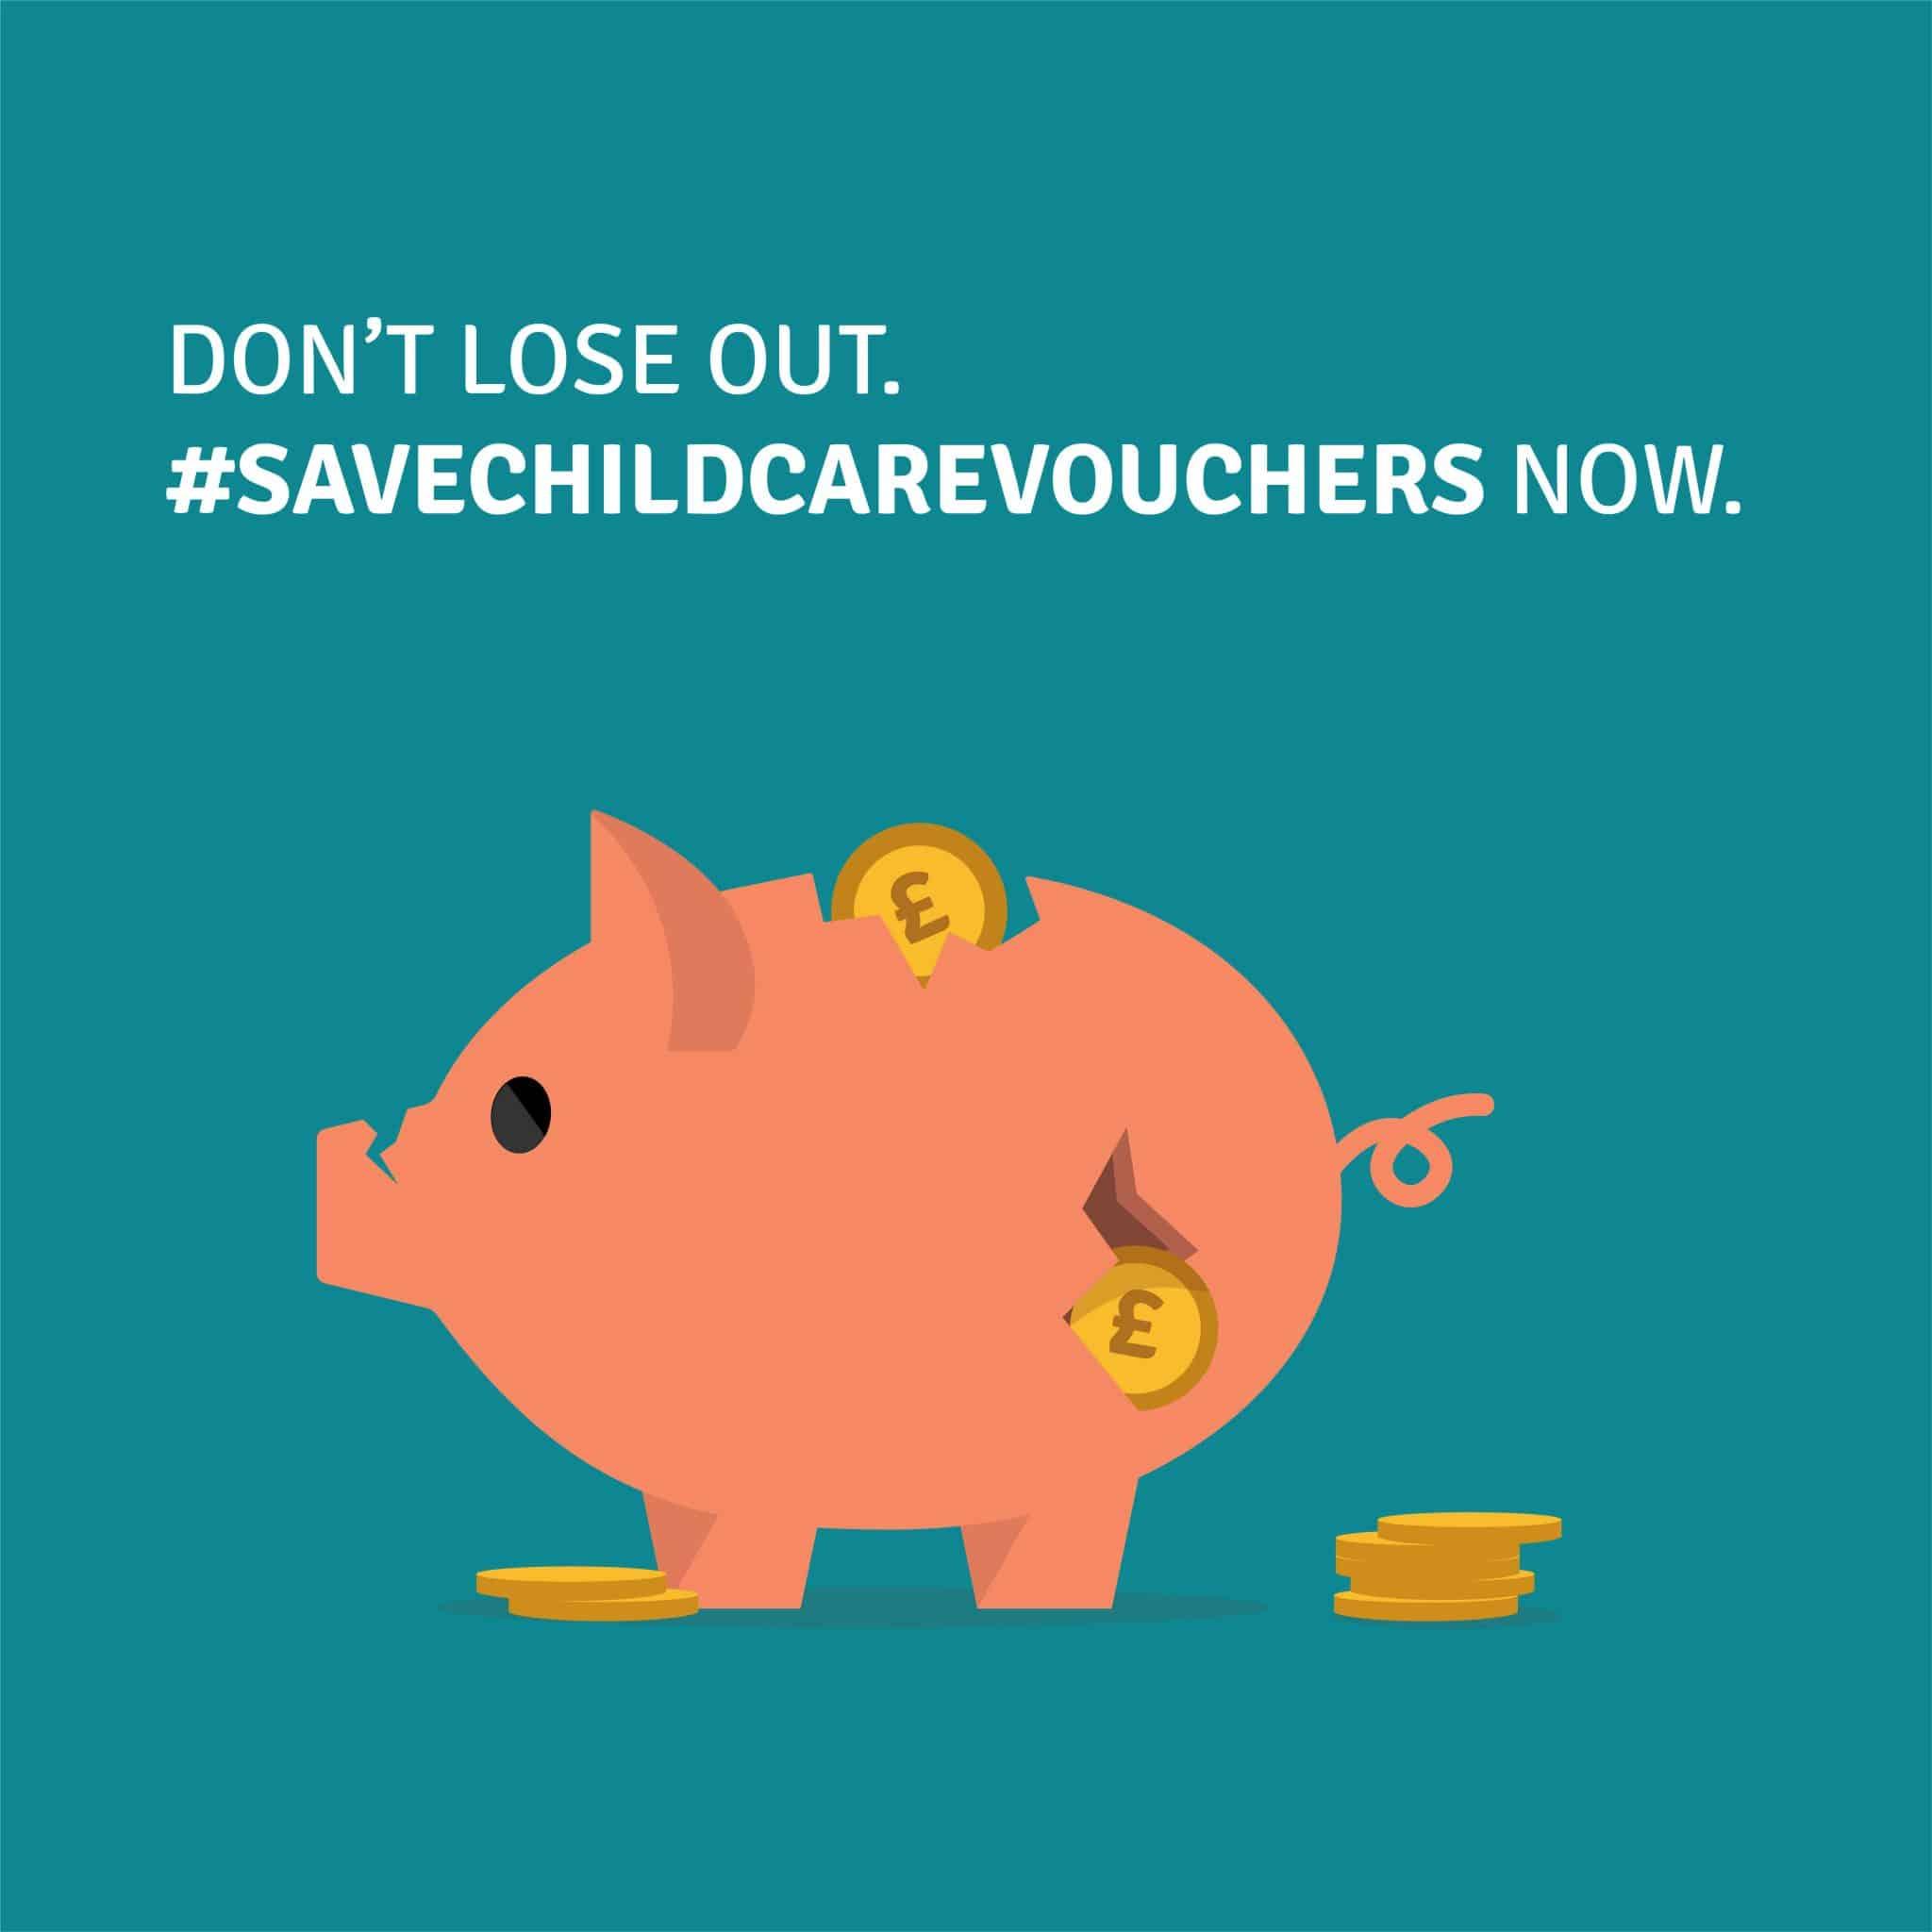 #SaveChildcareVouchers